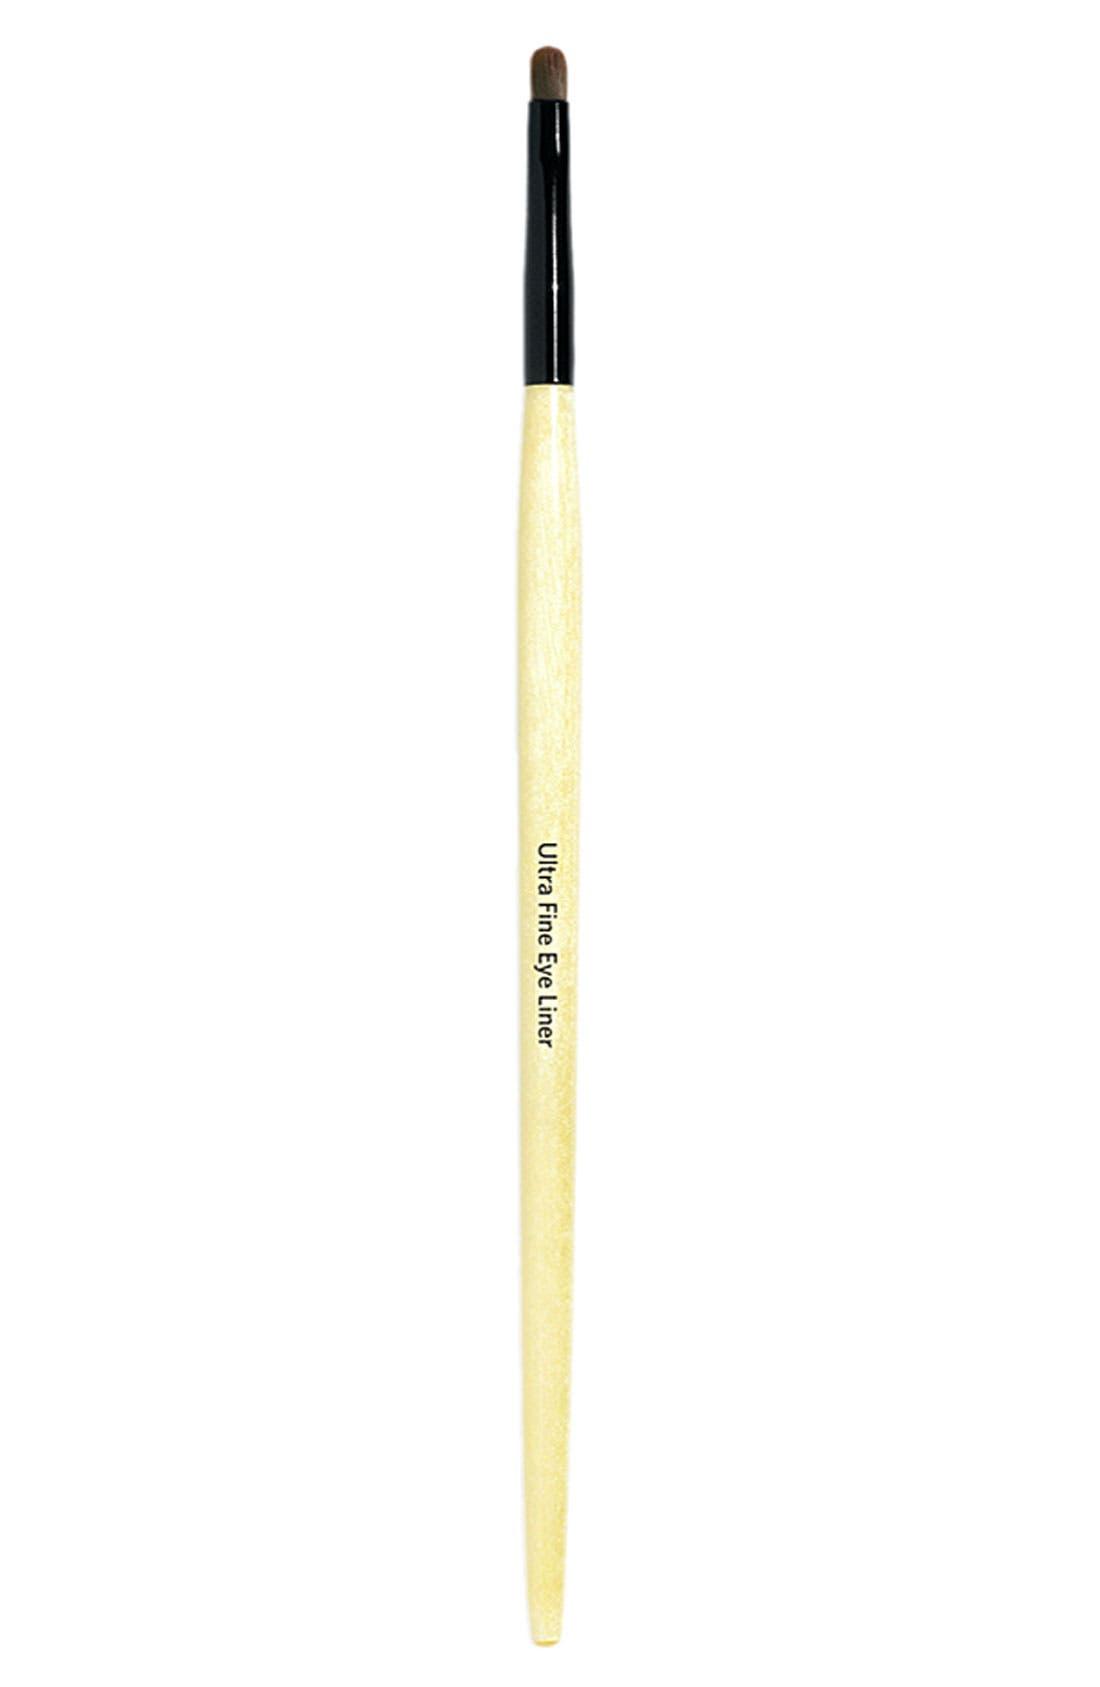 Ultra Fine Eyeliner Brush,                             Main thumbnail 1, color,                             NO COLOR